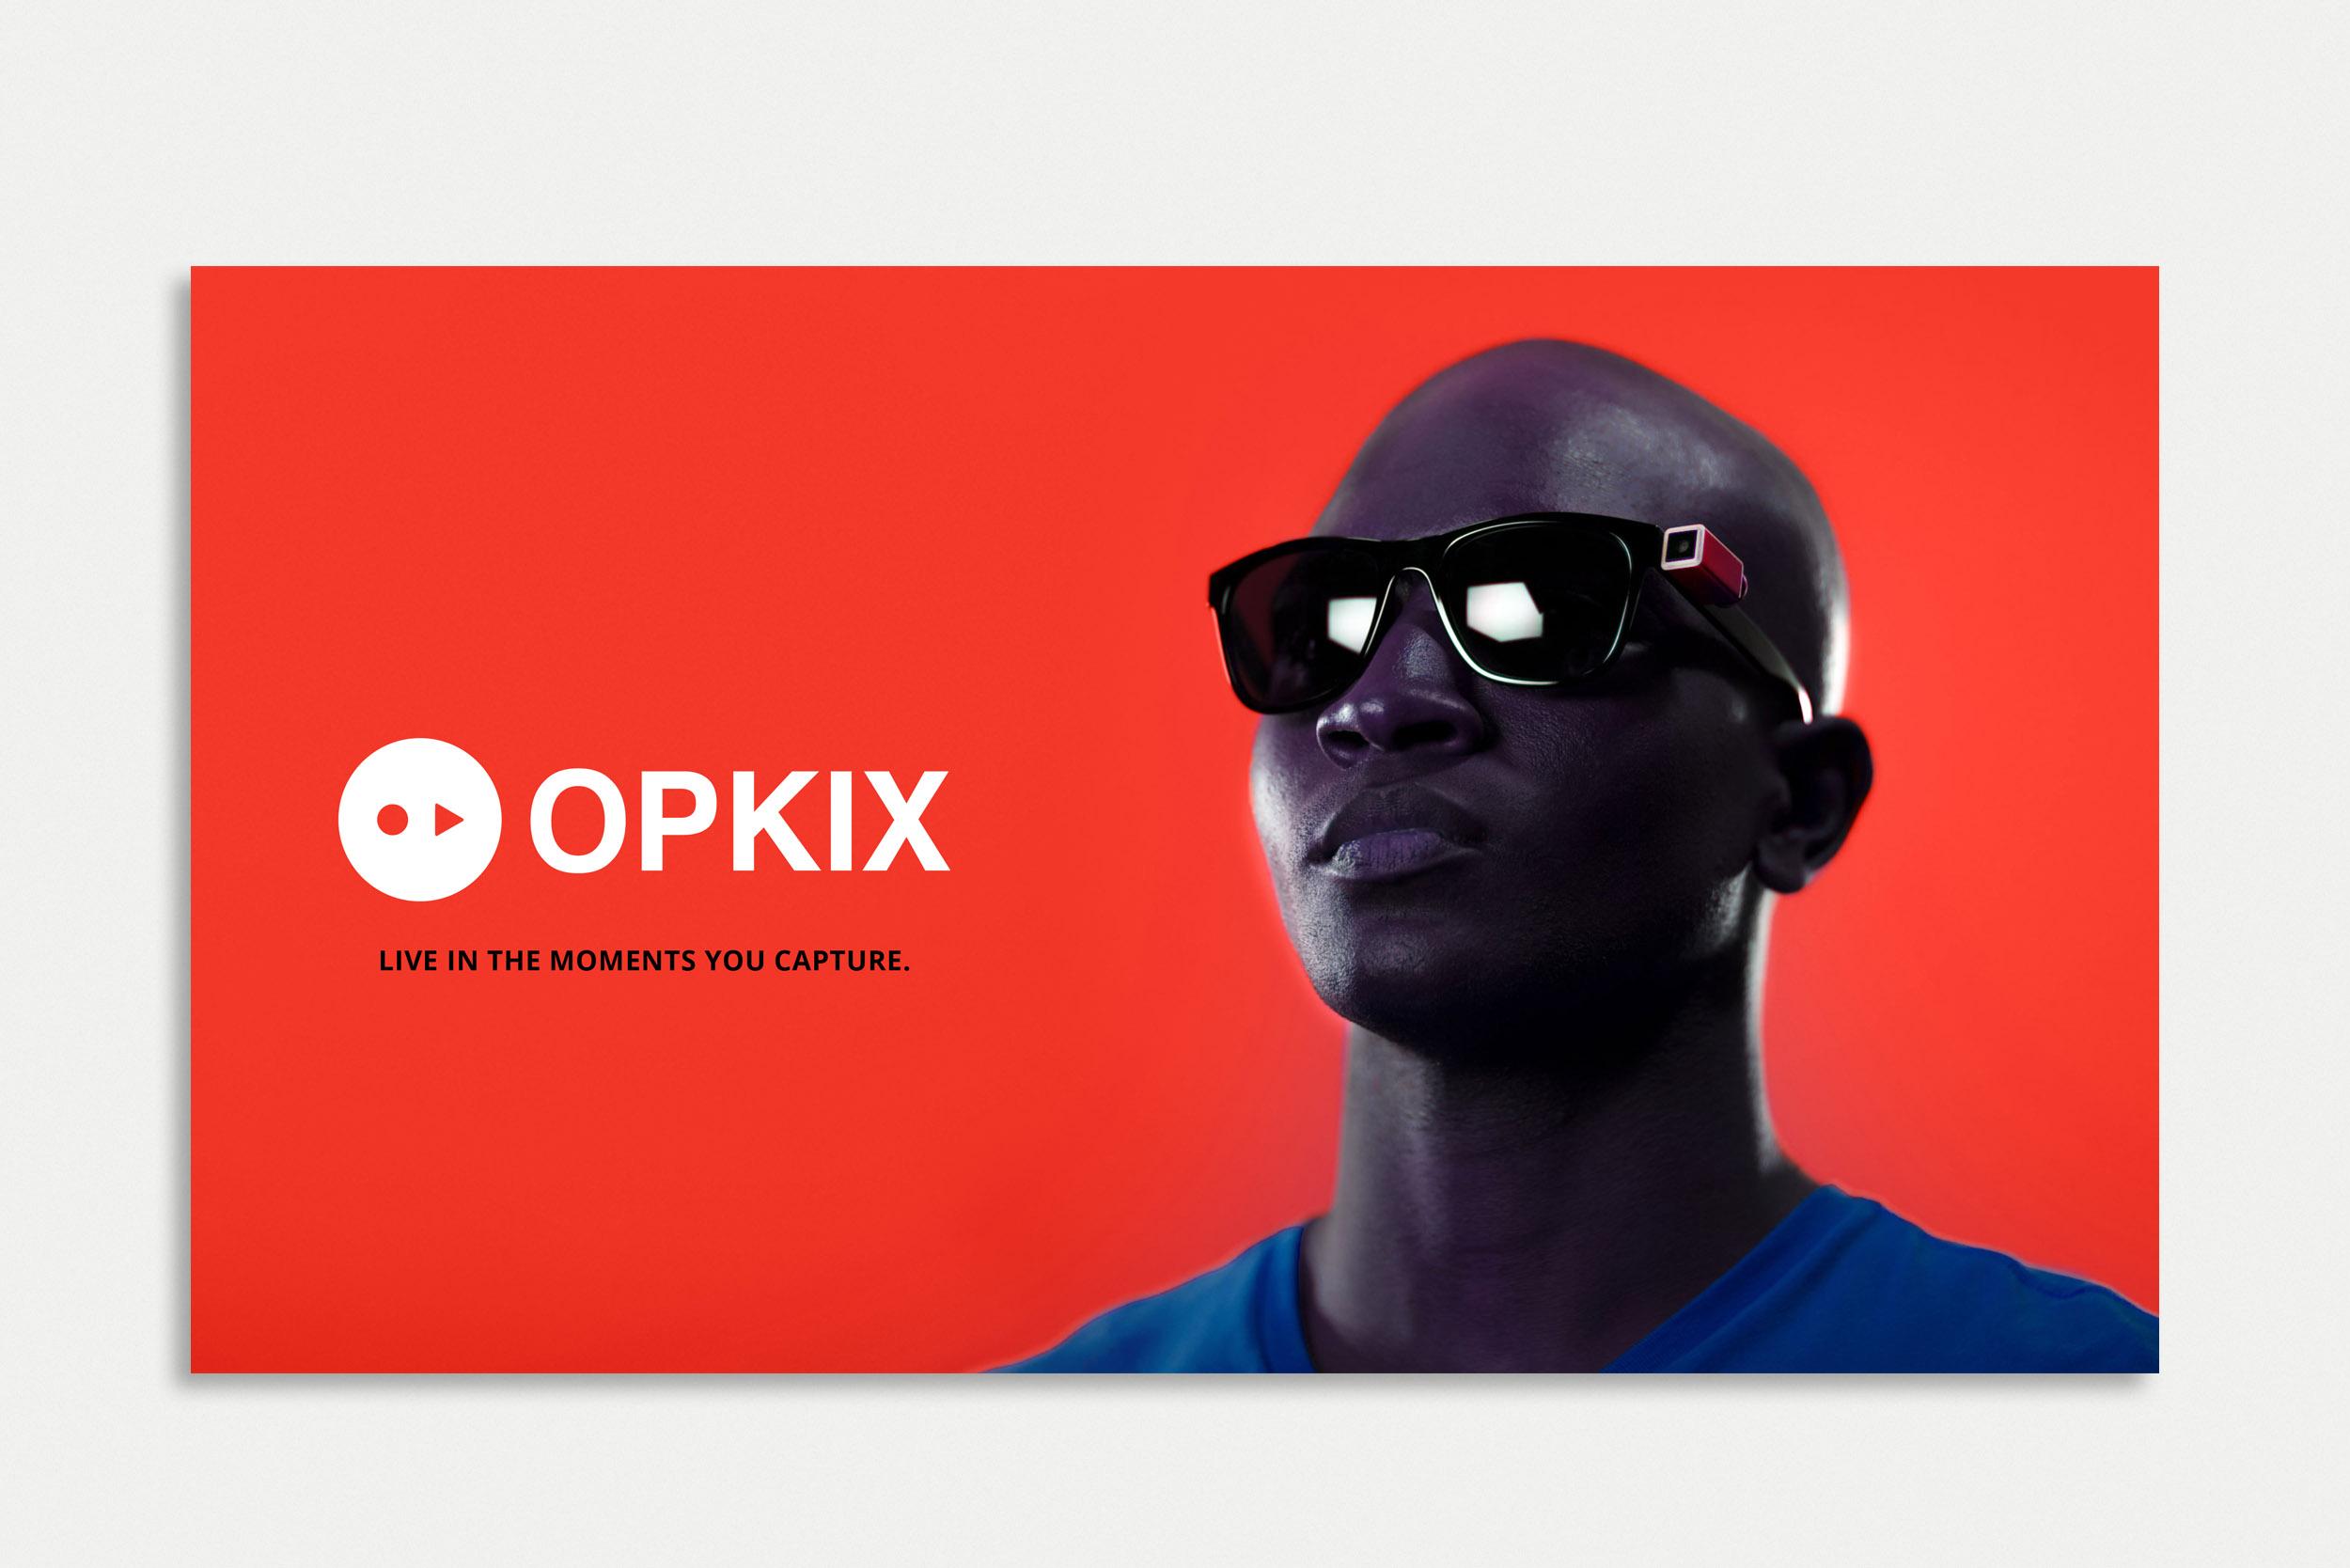 OPKIX-2.jpg